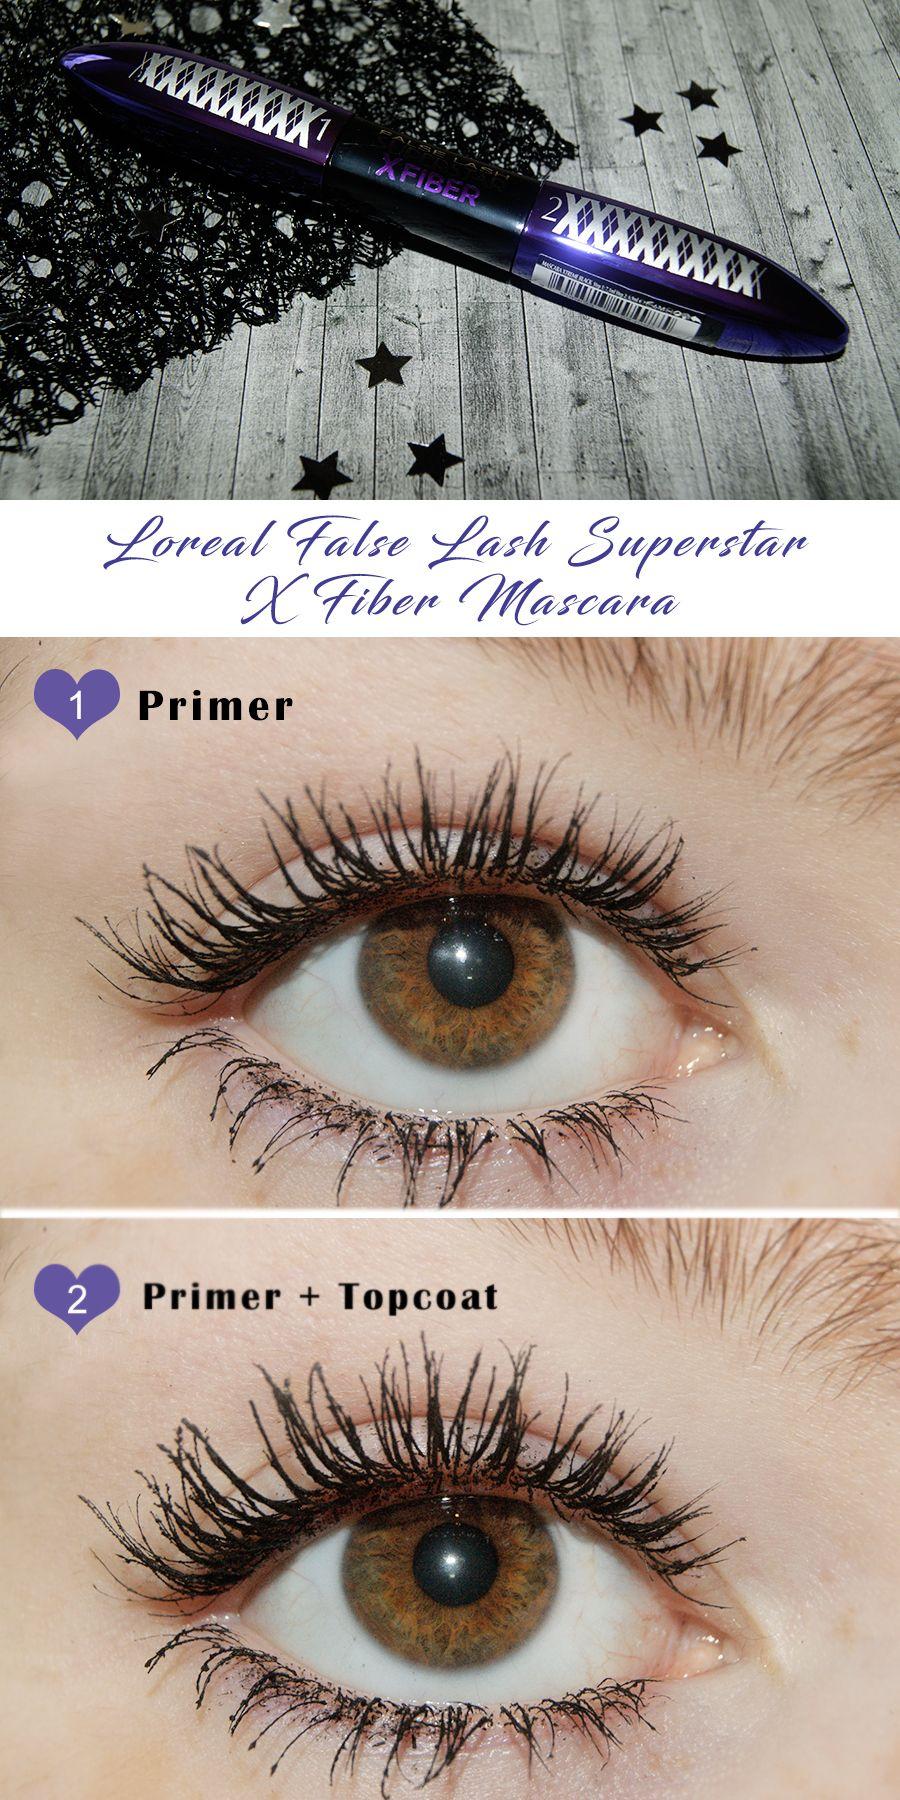 ff05770b48e Loreal False Lash Superstar X Fiber Mascara Fiber Mascara, Makeup Trends,  My Beauty,